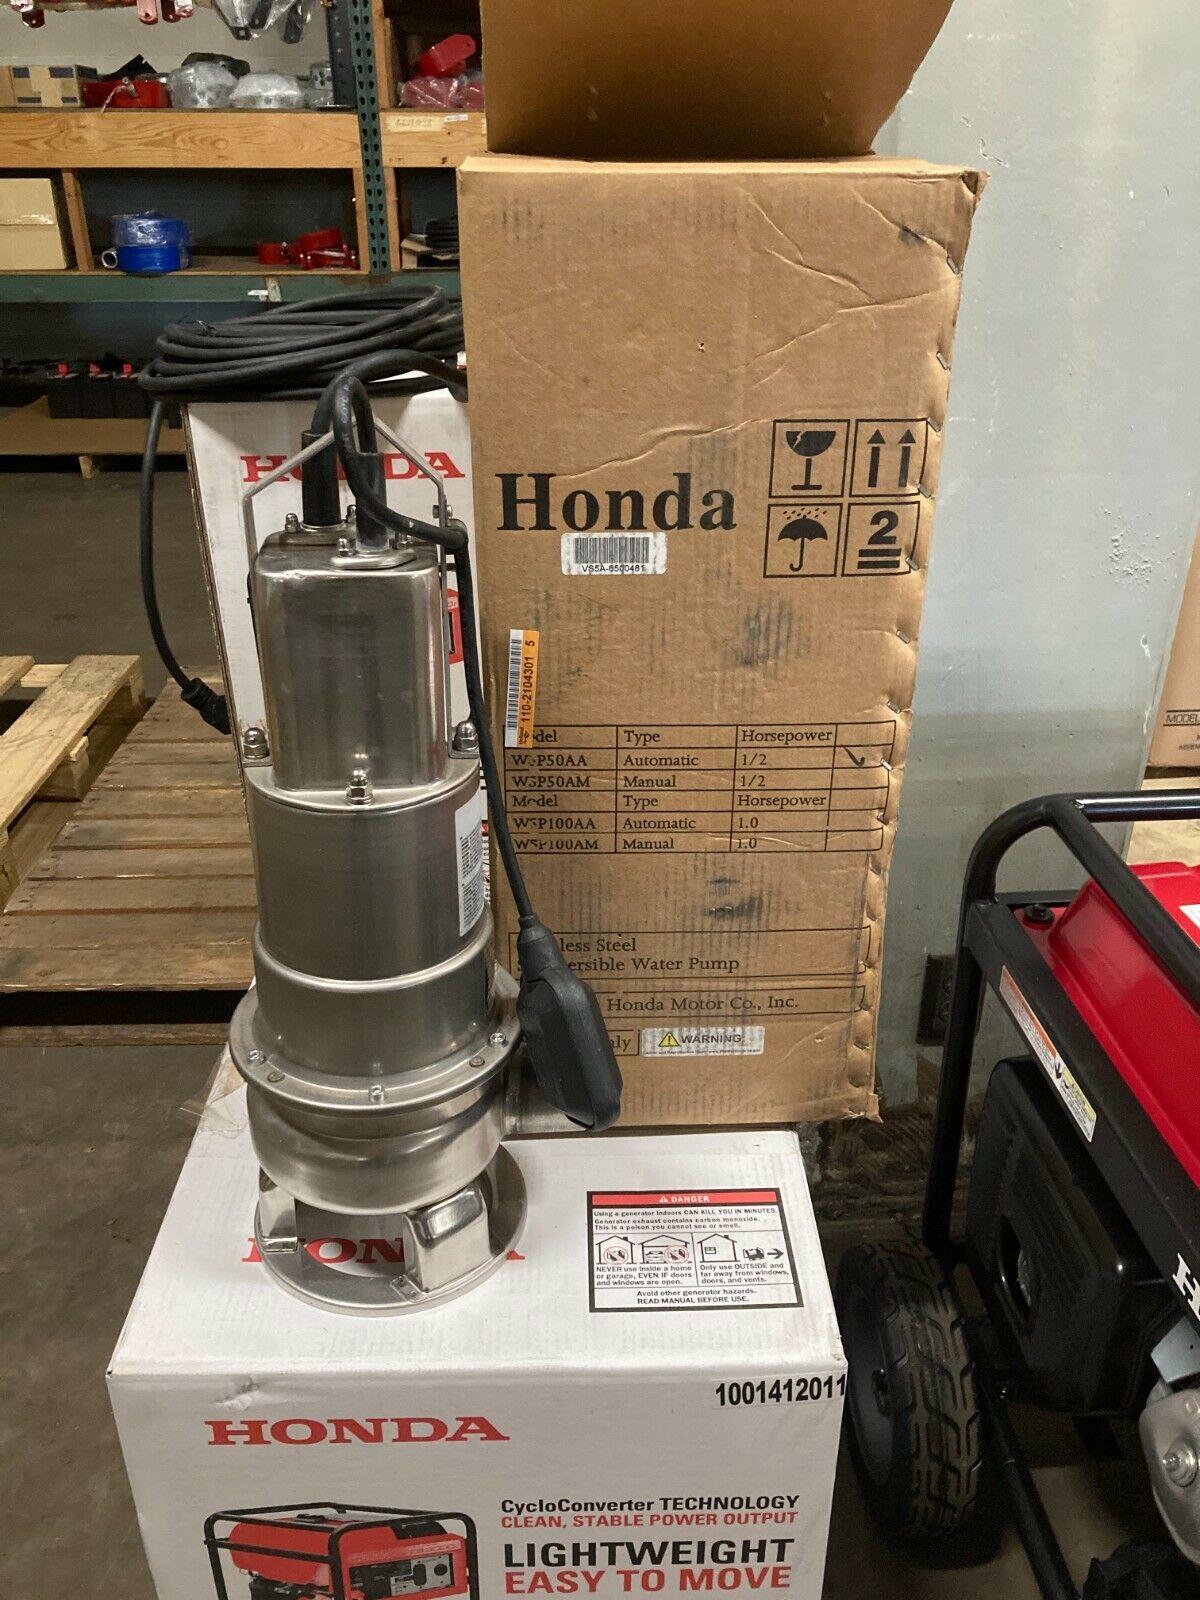 New Honda WSP50AA submersible trash pump